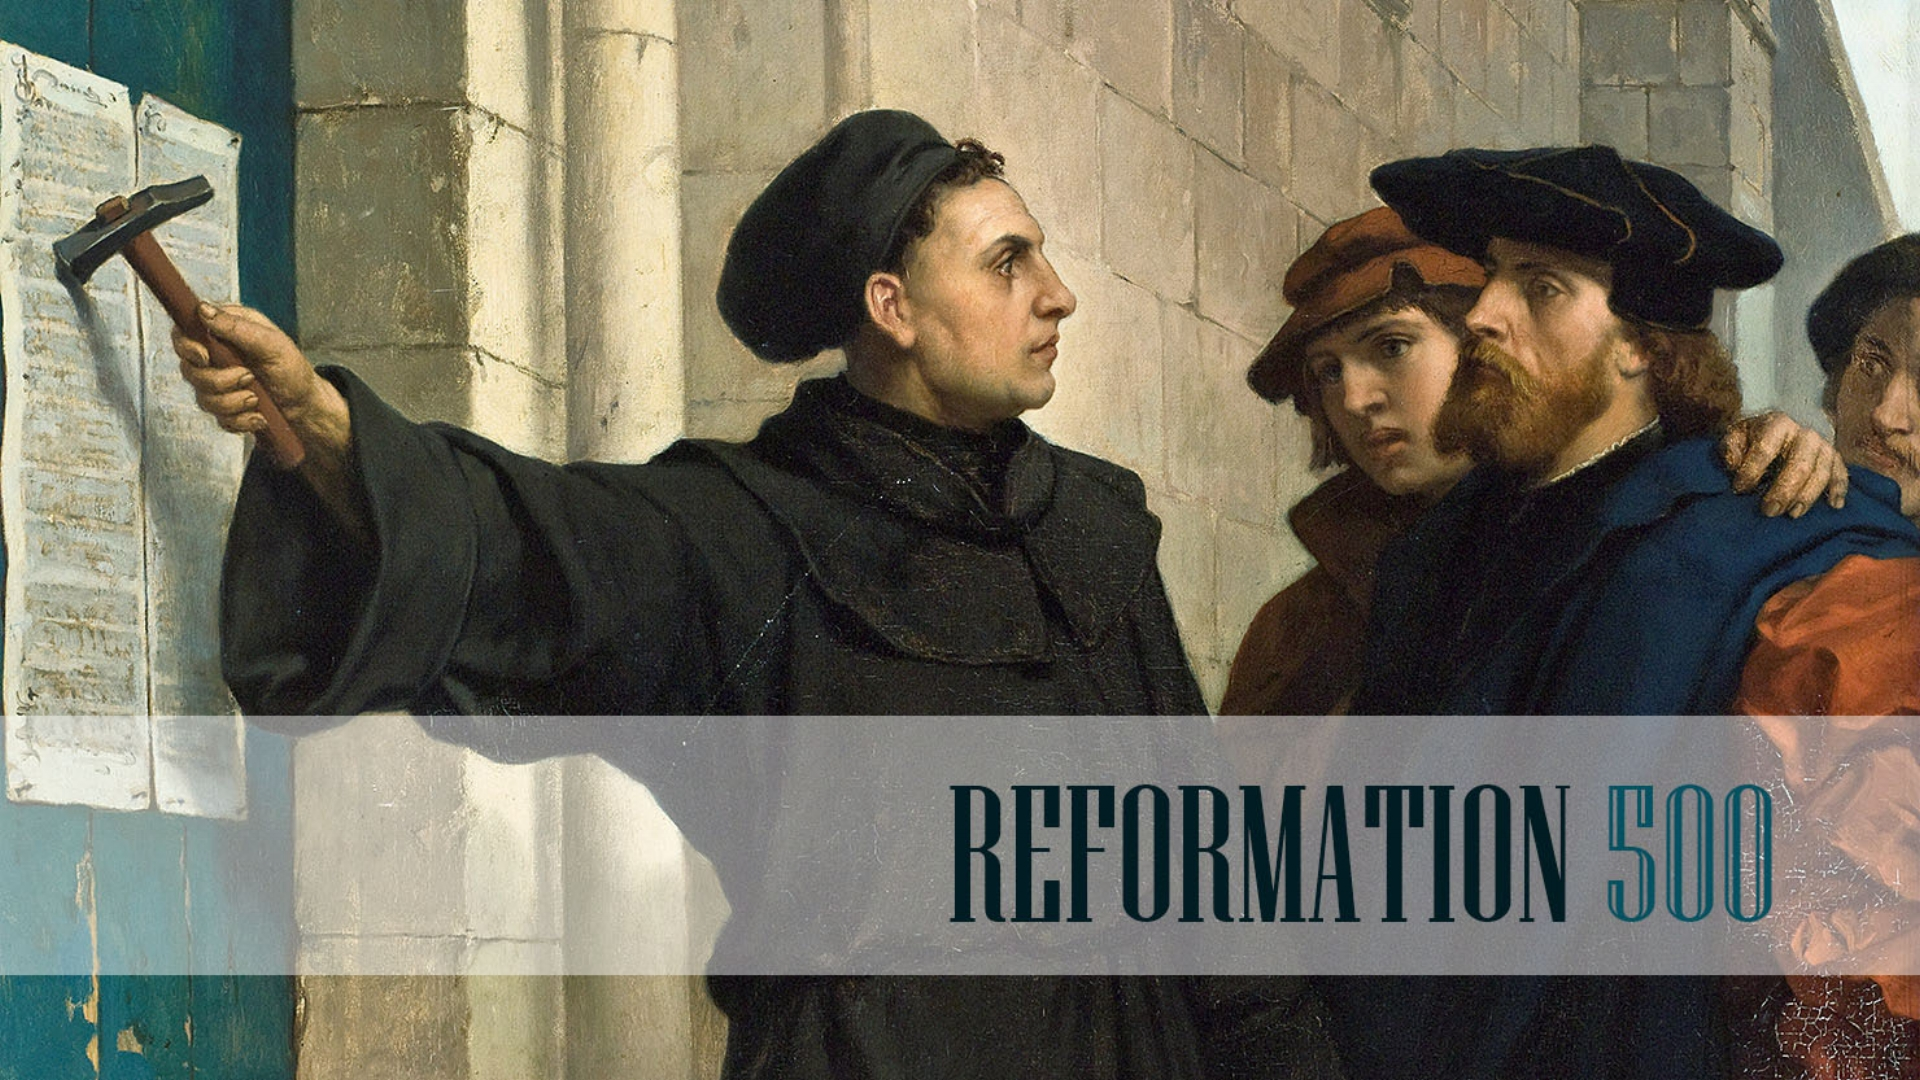 Reformation 500 (2017)